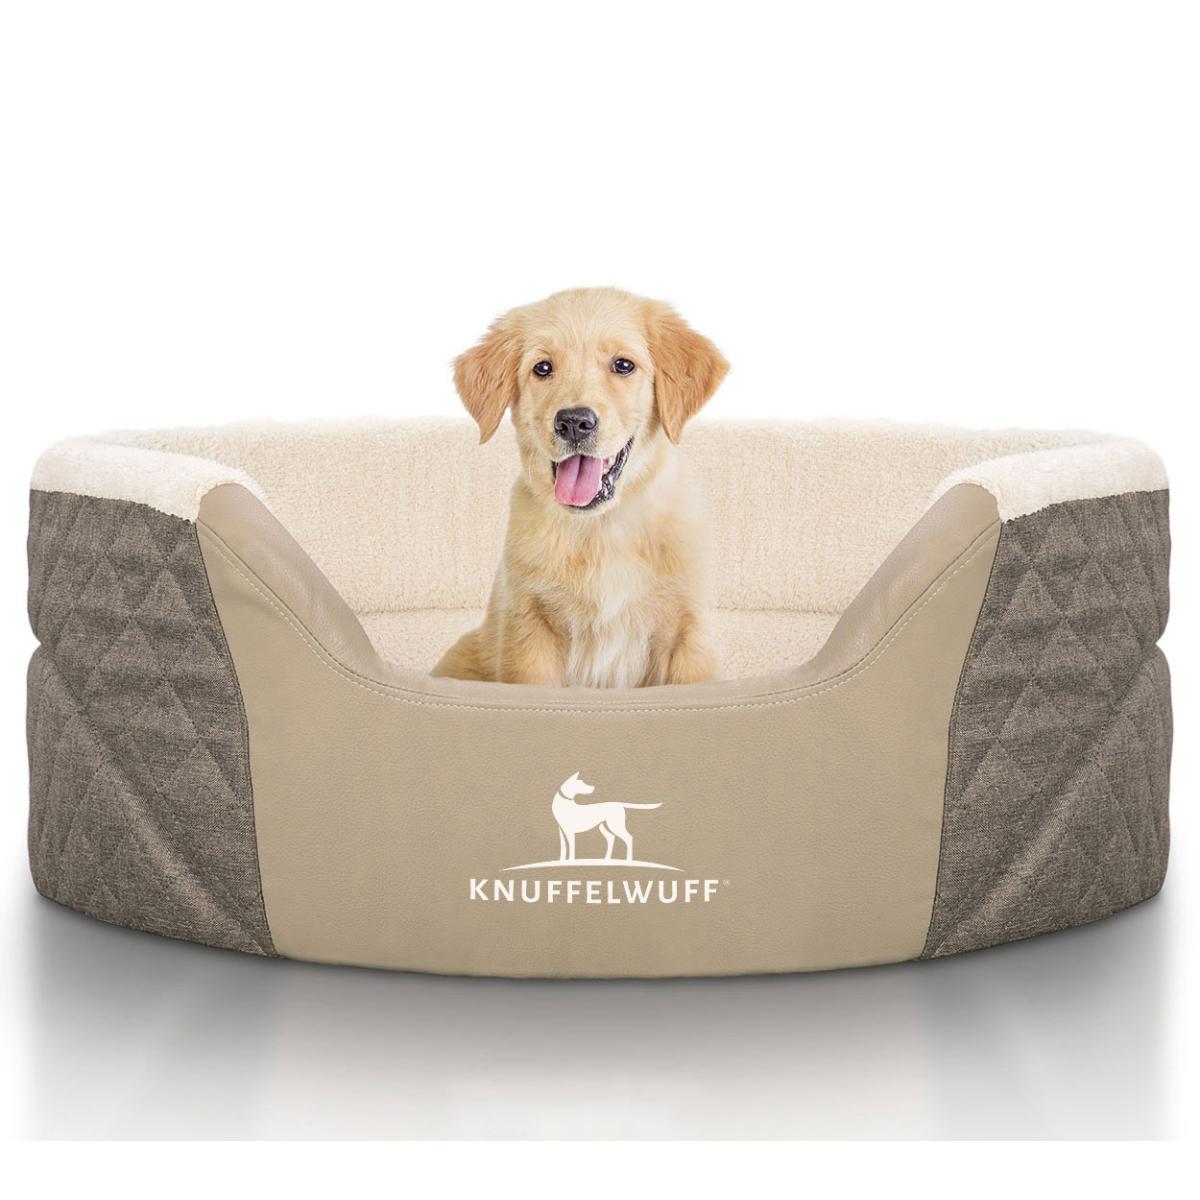 knuffelwuff orthop disches hundebett lena mit hohem. Black Bedroom Furniture Sets. Home Design Ideas